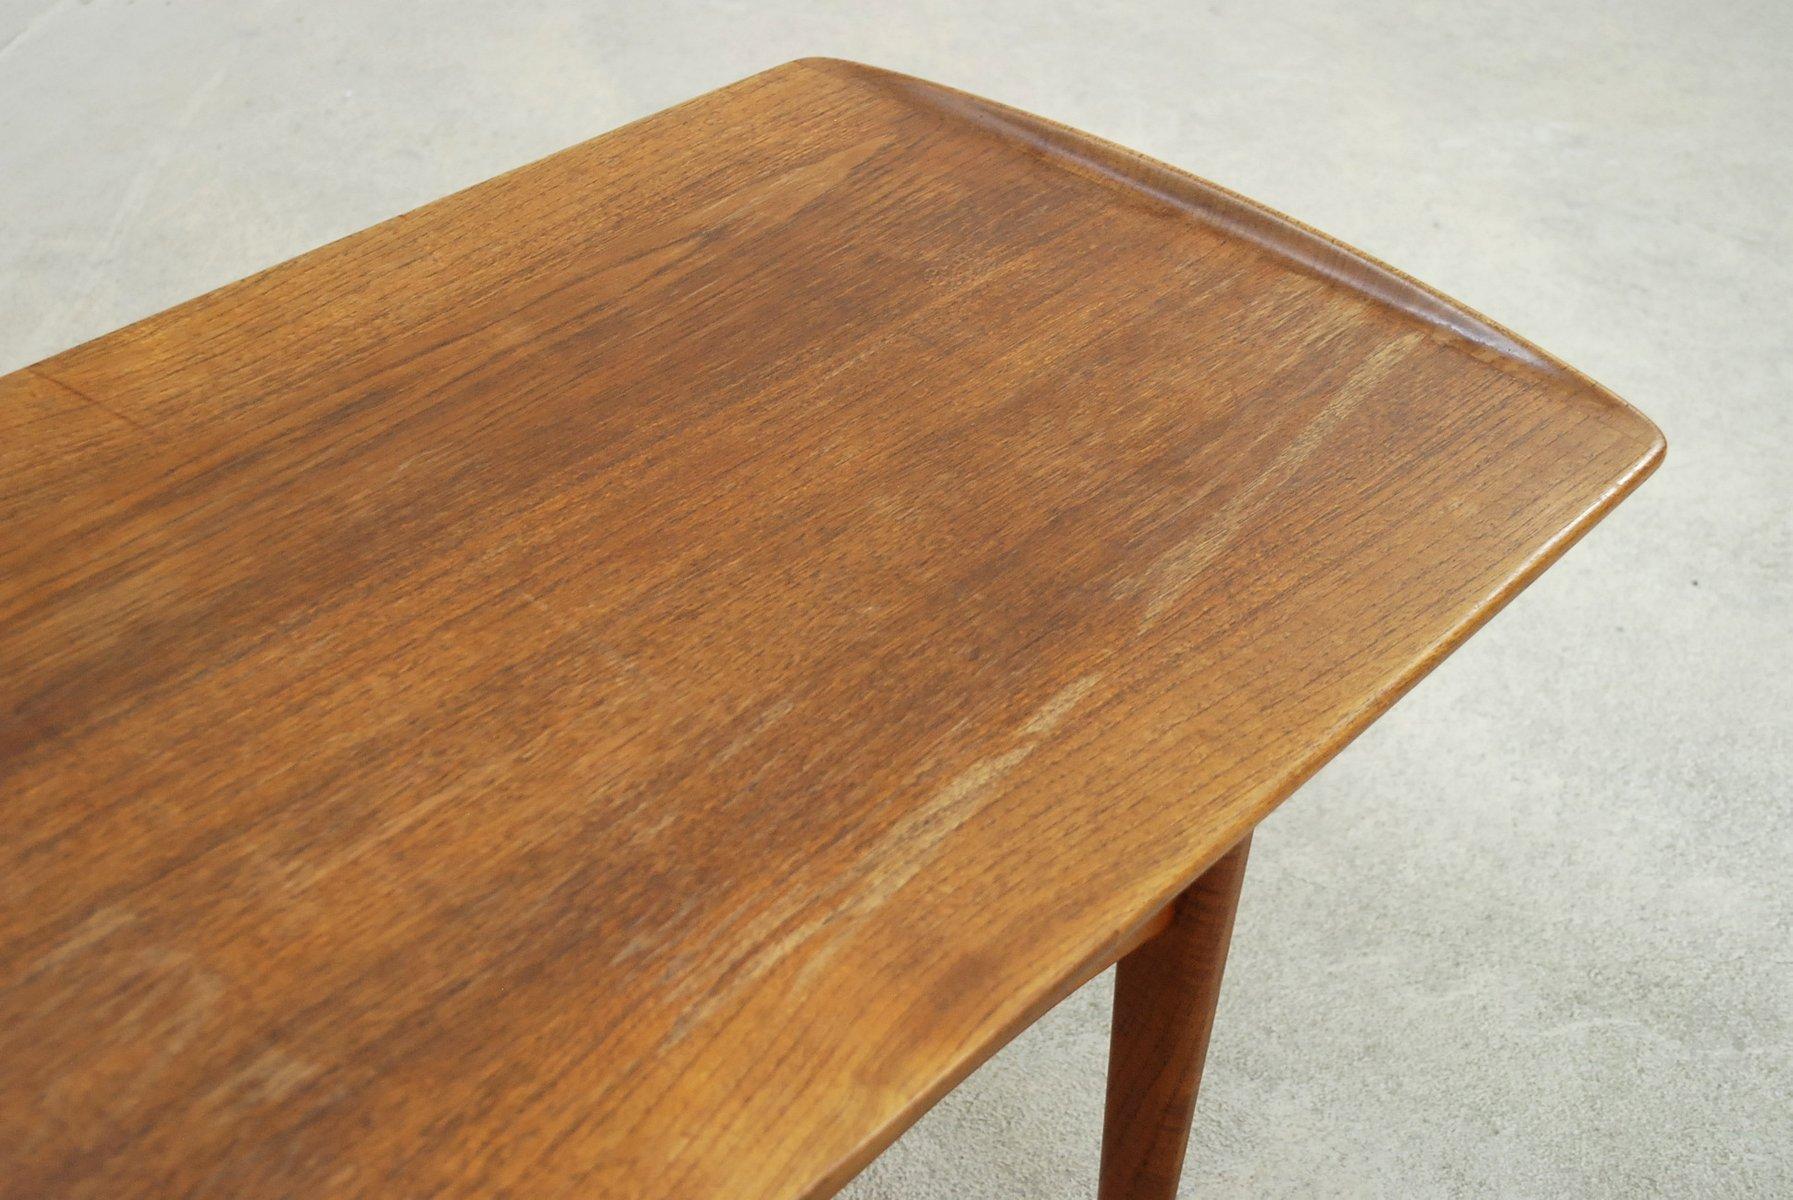 Danish FD503 Teak Coffee Table by Tove & Edvard Kindt-Larsen for ...